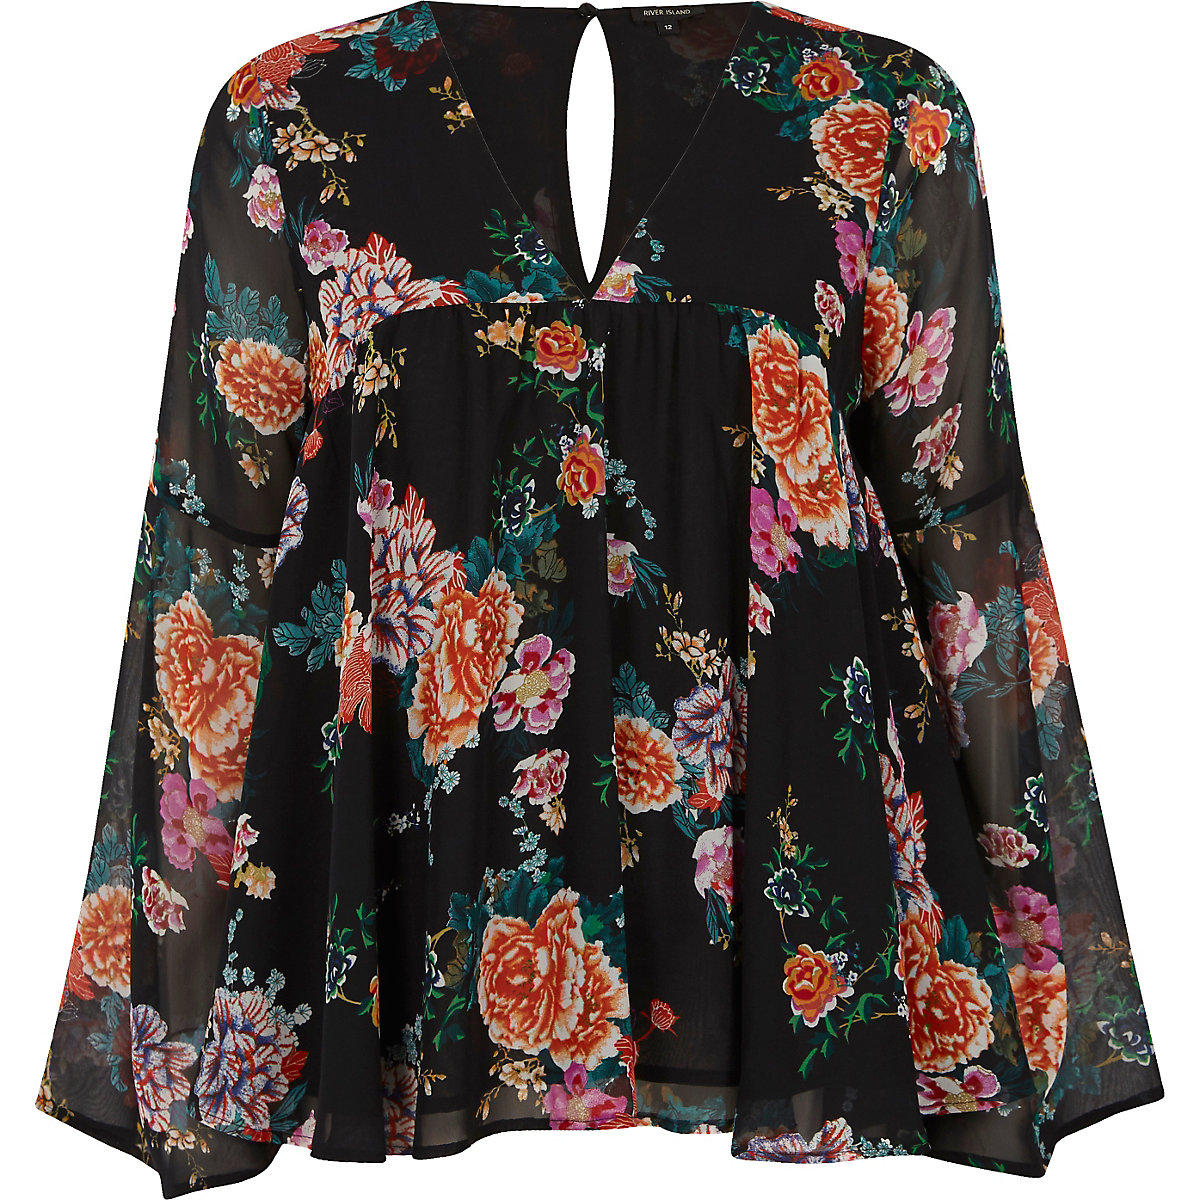 Black floral print smock blouse